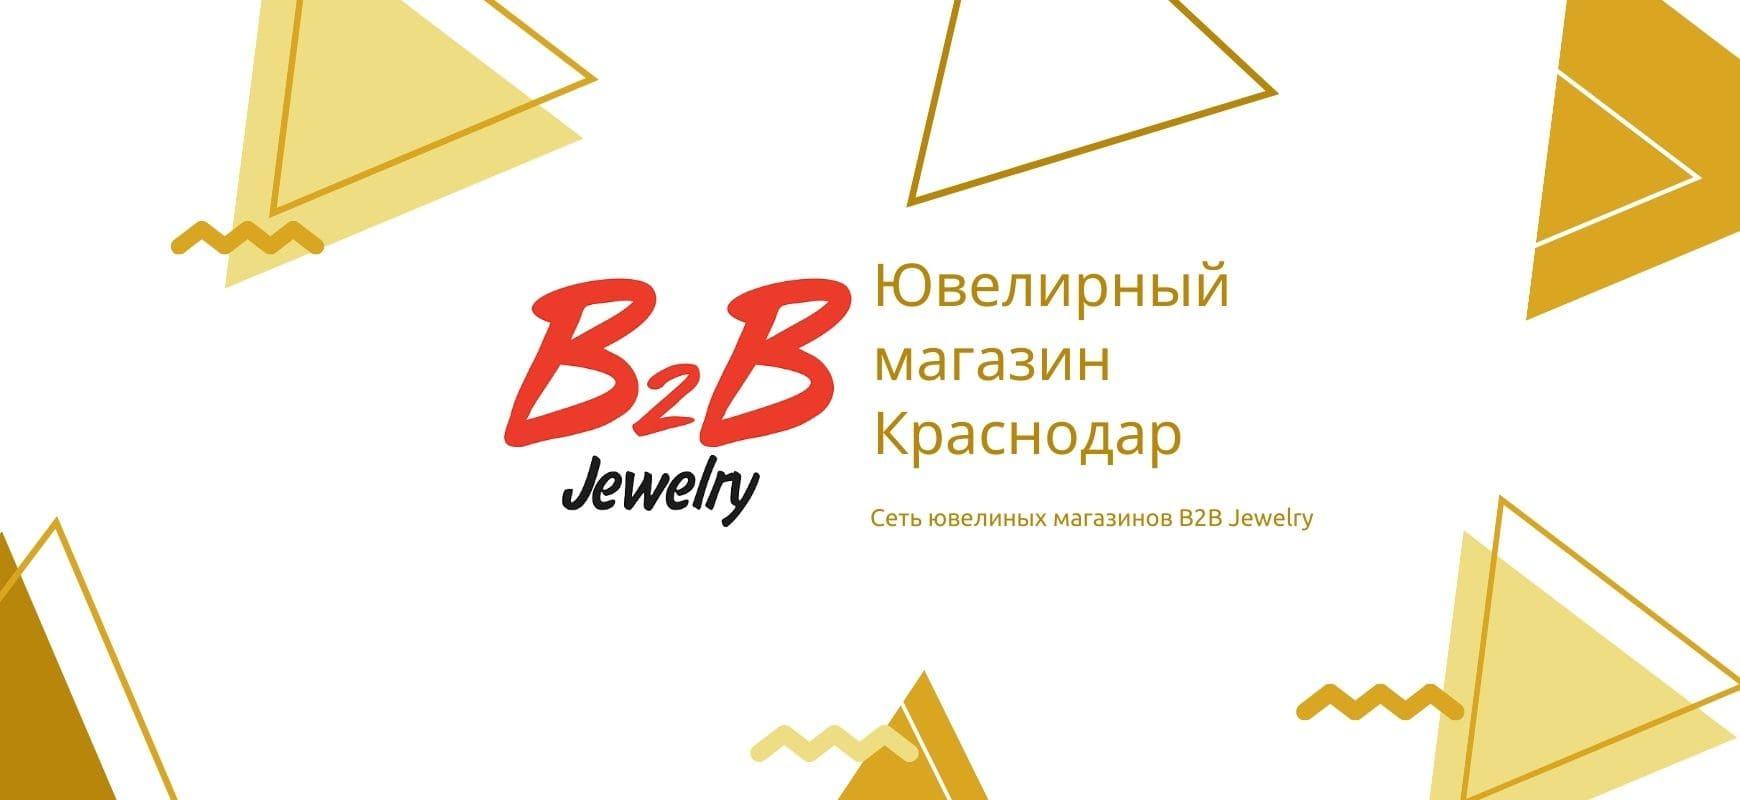 B2B JEWELRY КРАСНОДАР